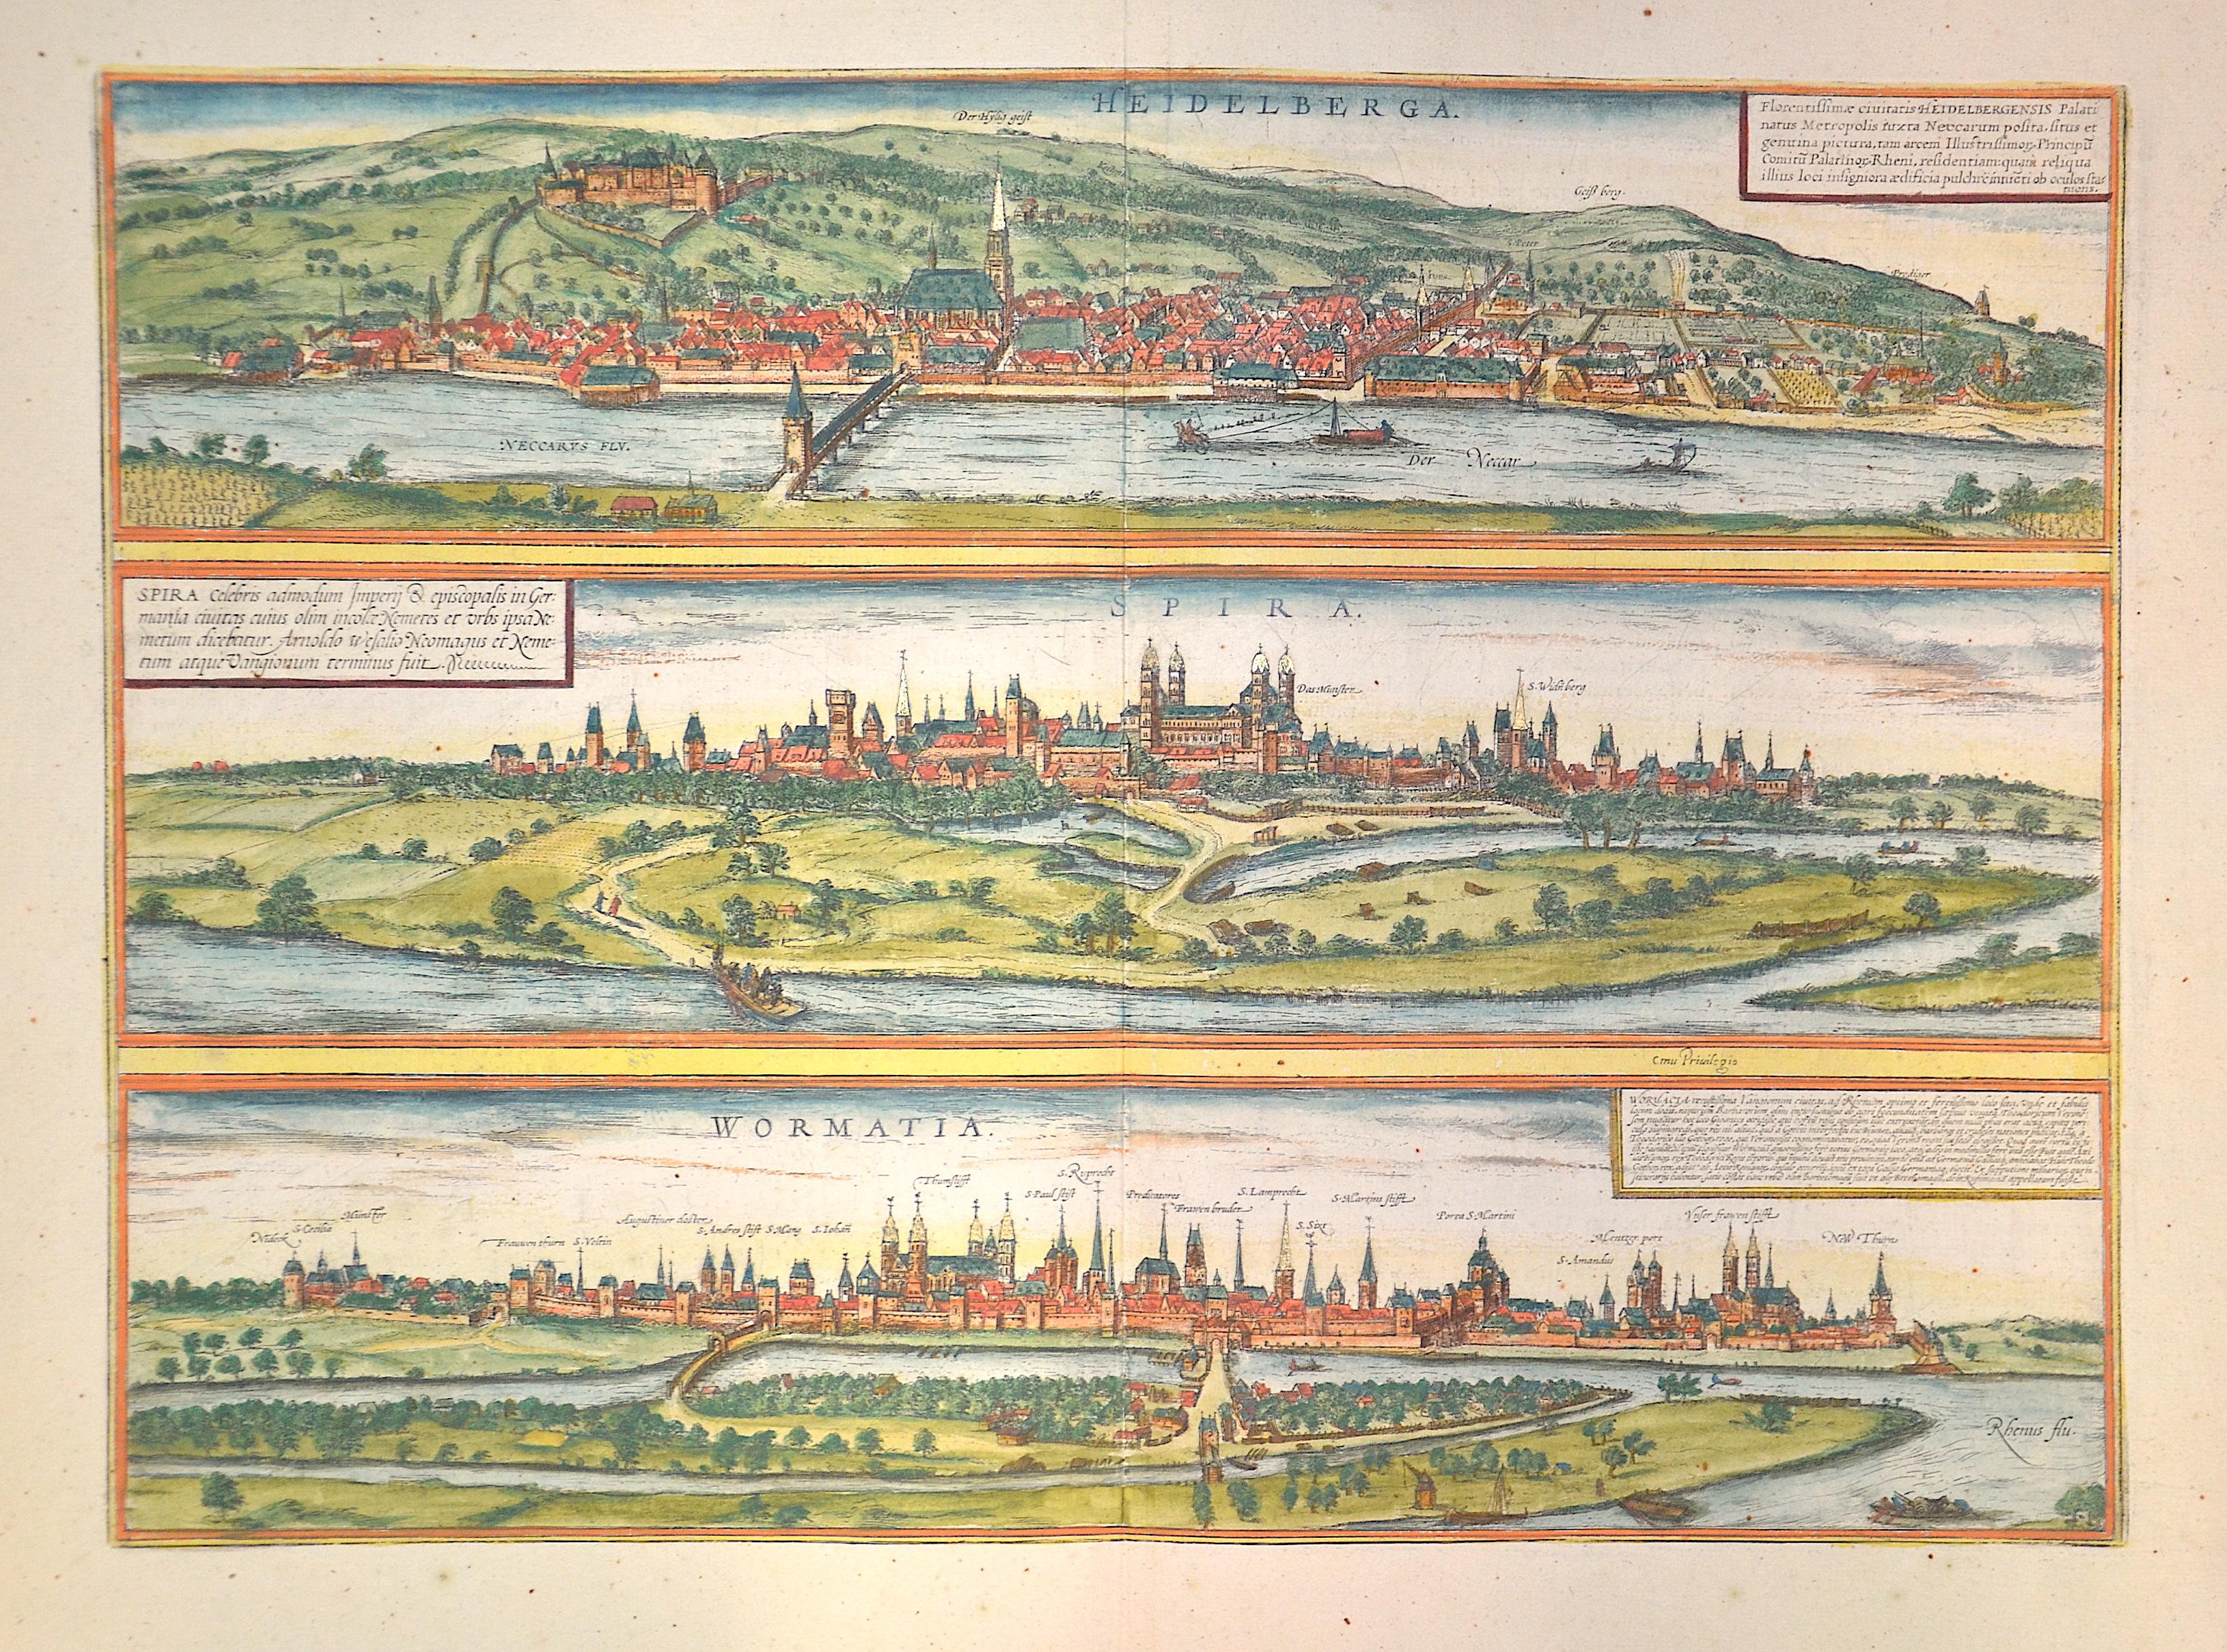 Braun/Hogenberg Franz/ Georg Spira/ Wormatia/Heidelberga